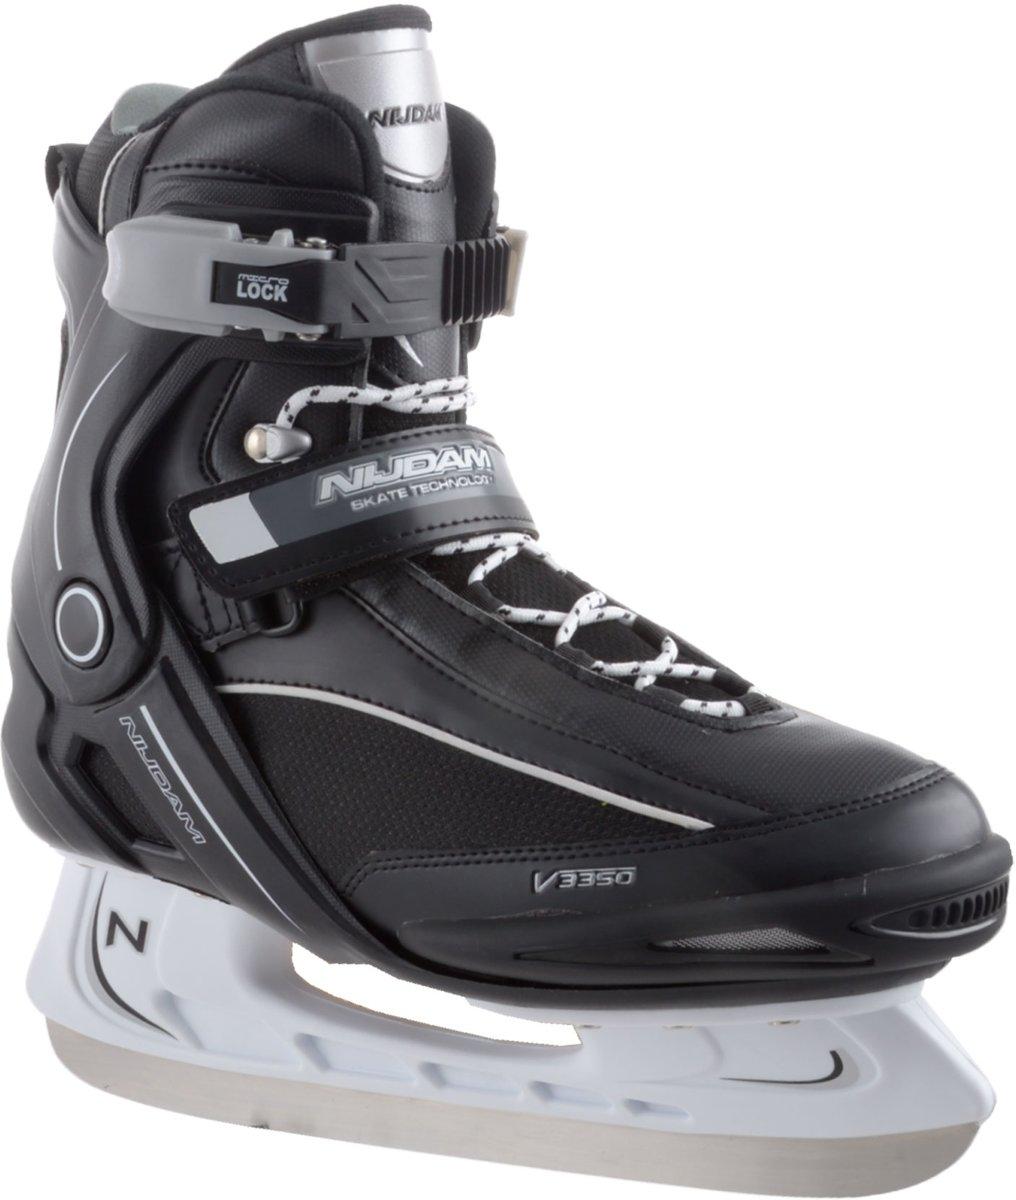 Nijdam 3350 IJshockeyschaats - Semi-Softboot - Zwart/Wit - Maat 41